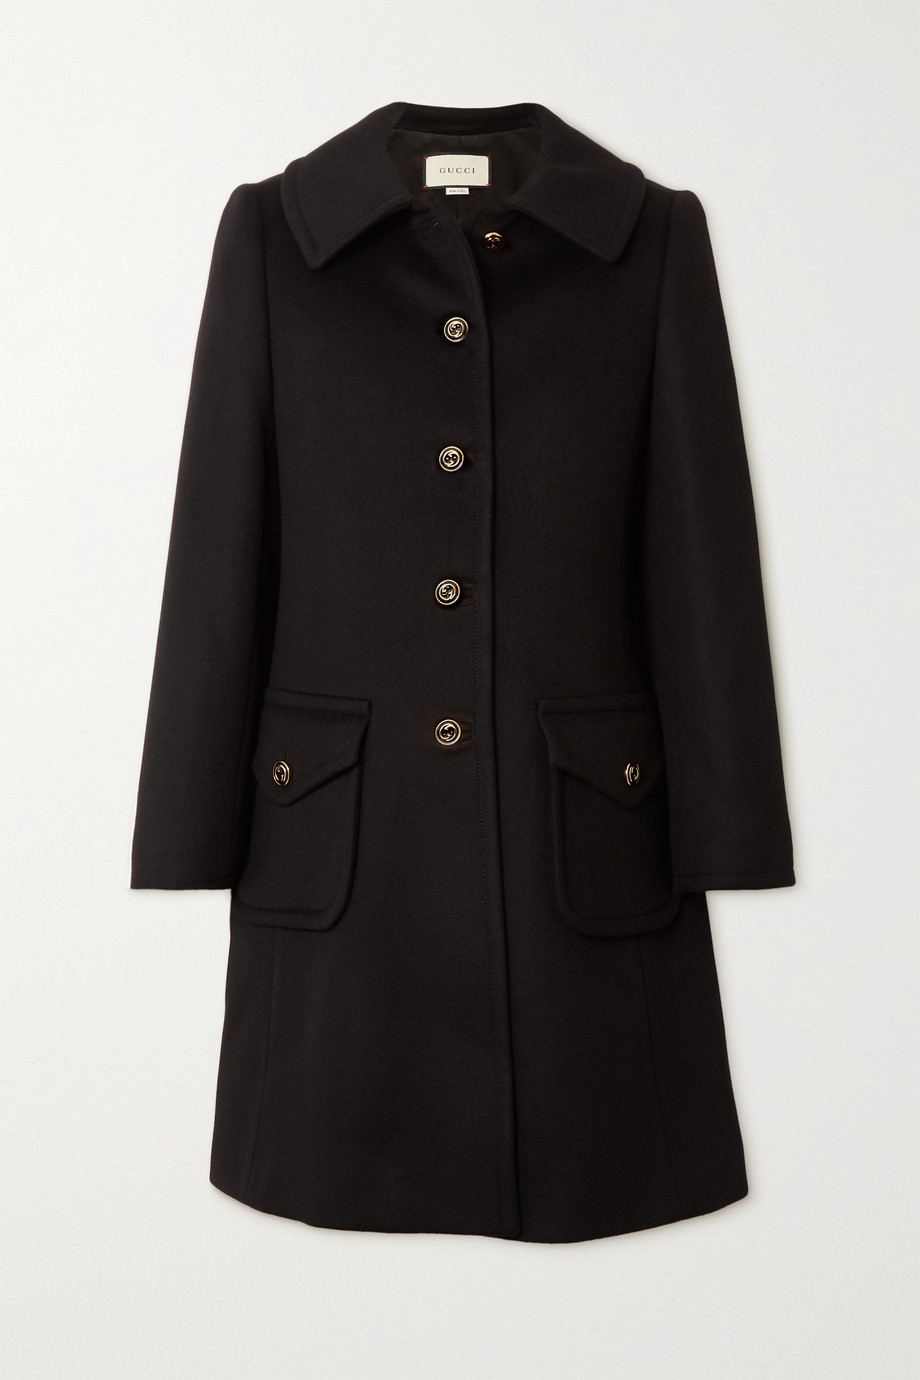 Gucci Button-embellished wool-felt coat